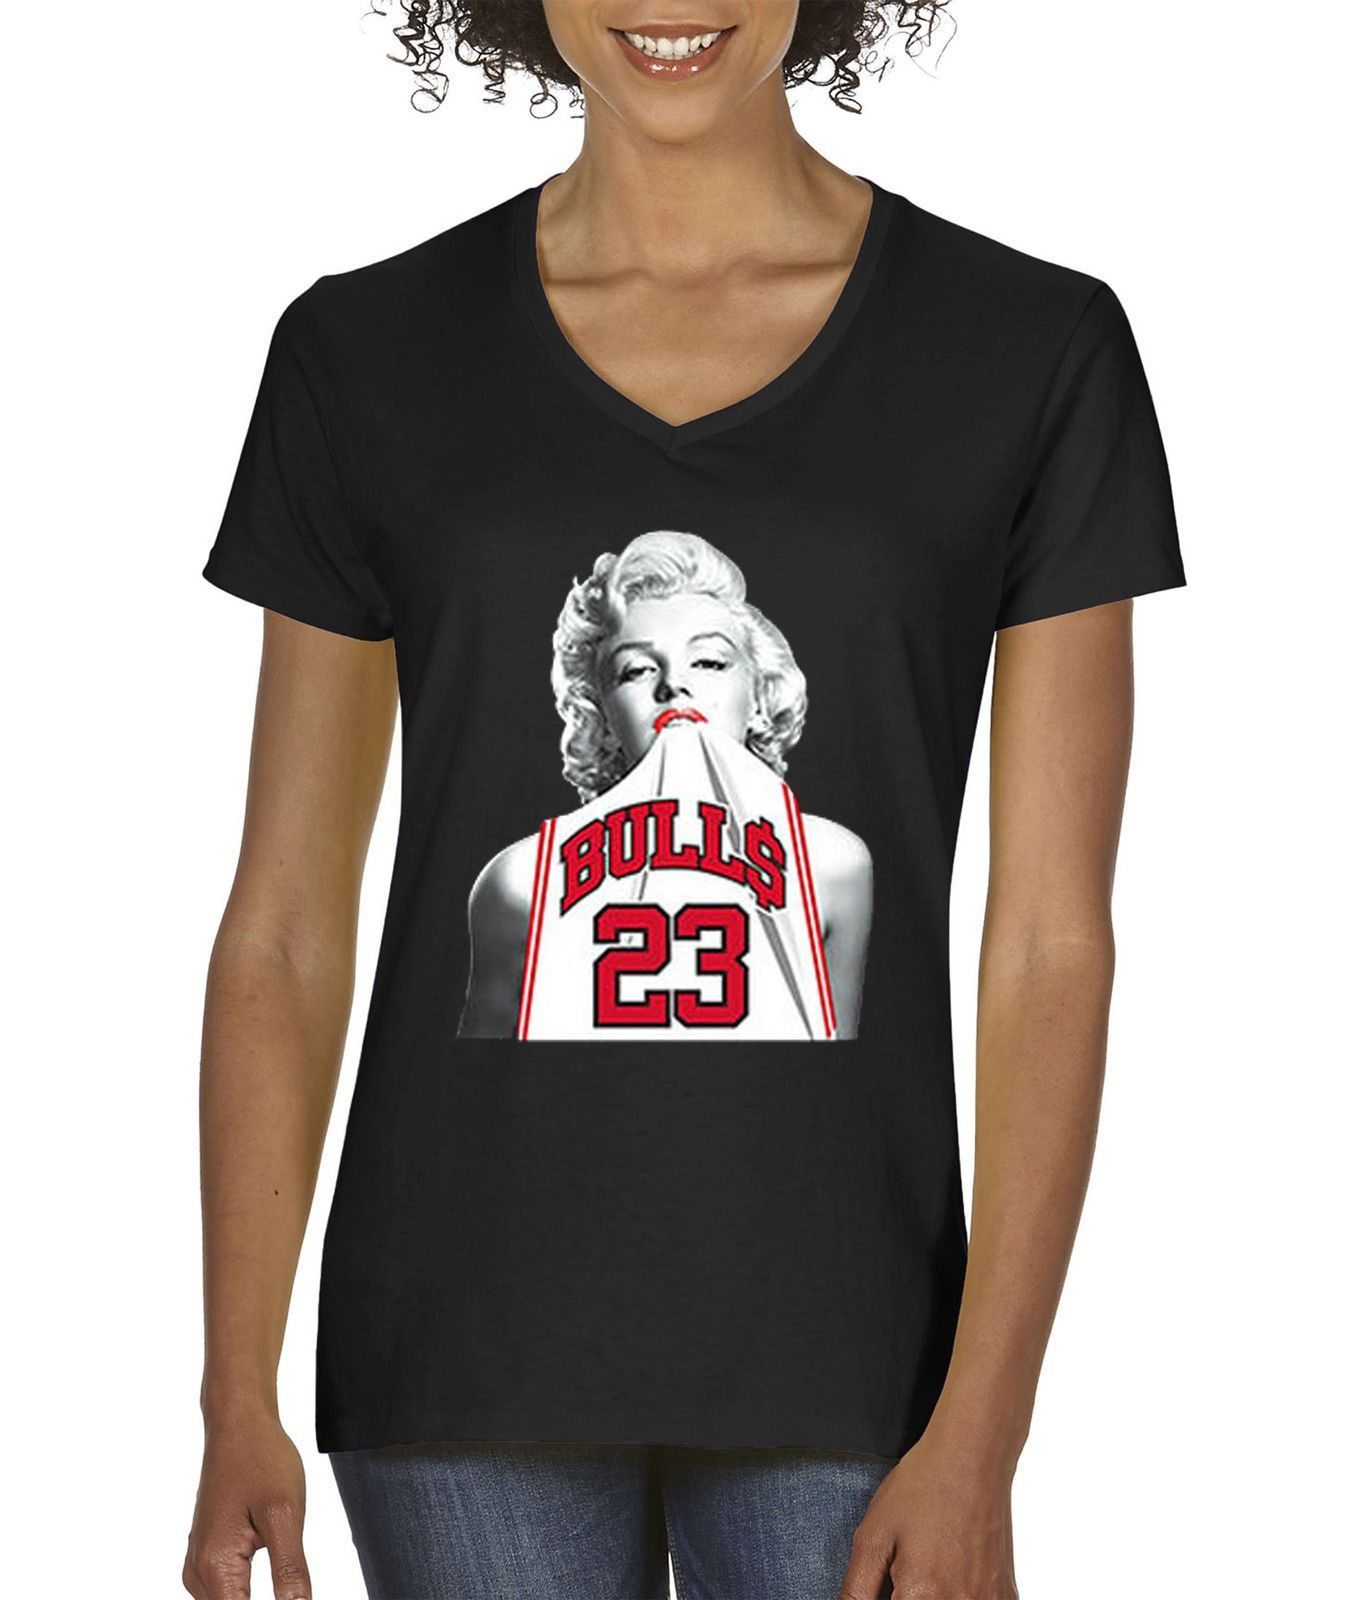 1cc1045b0e53 Way 193 - Women S V-Neck T-Shirt Marilyn Monroe Bulls 23 Jersey Jordan